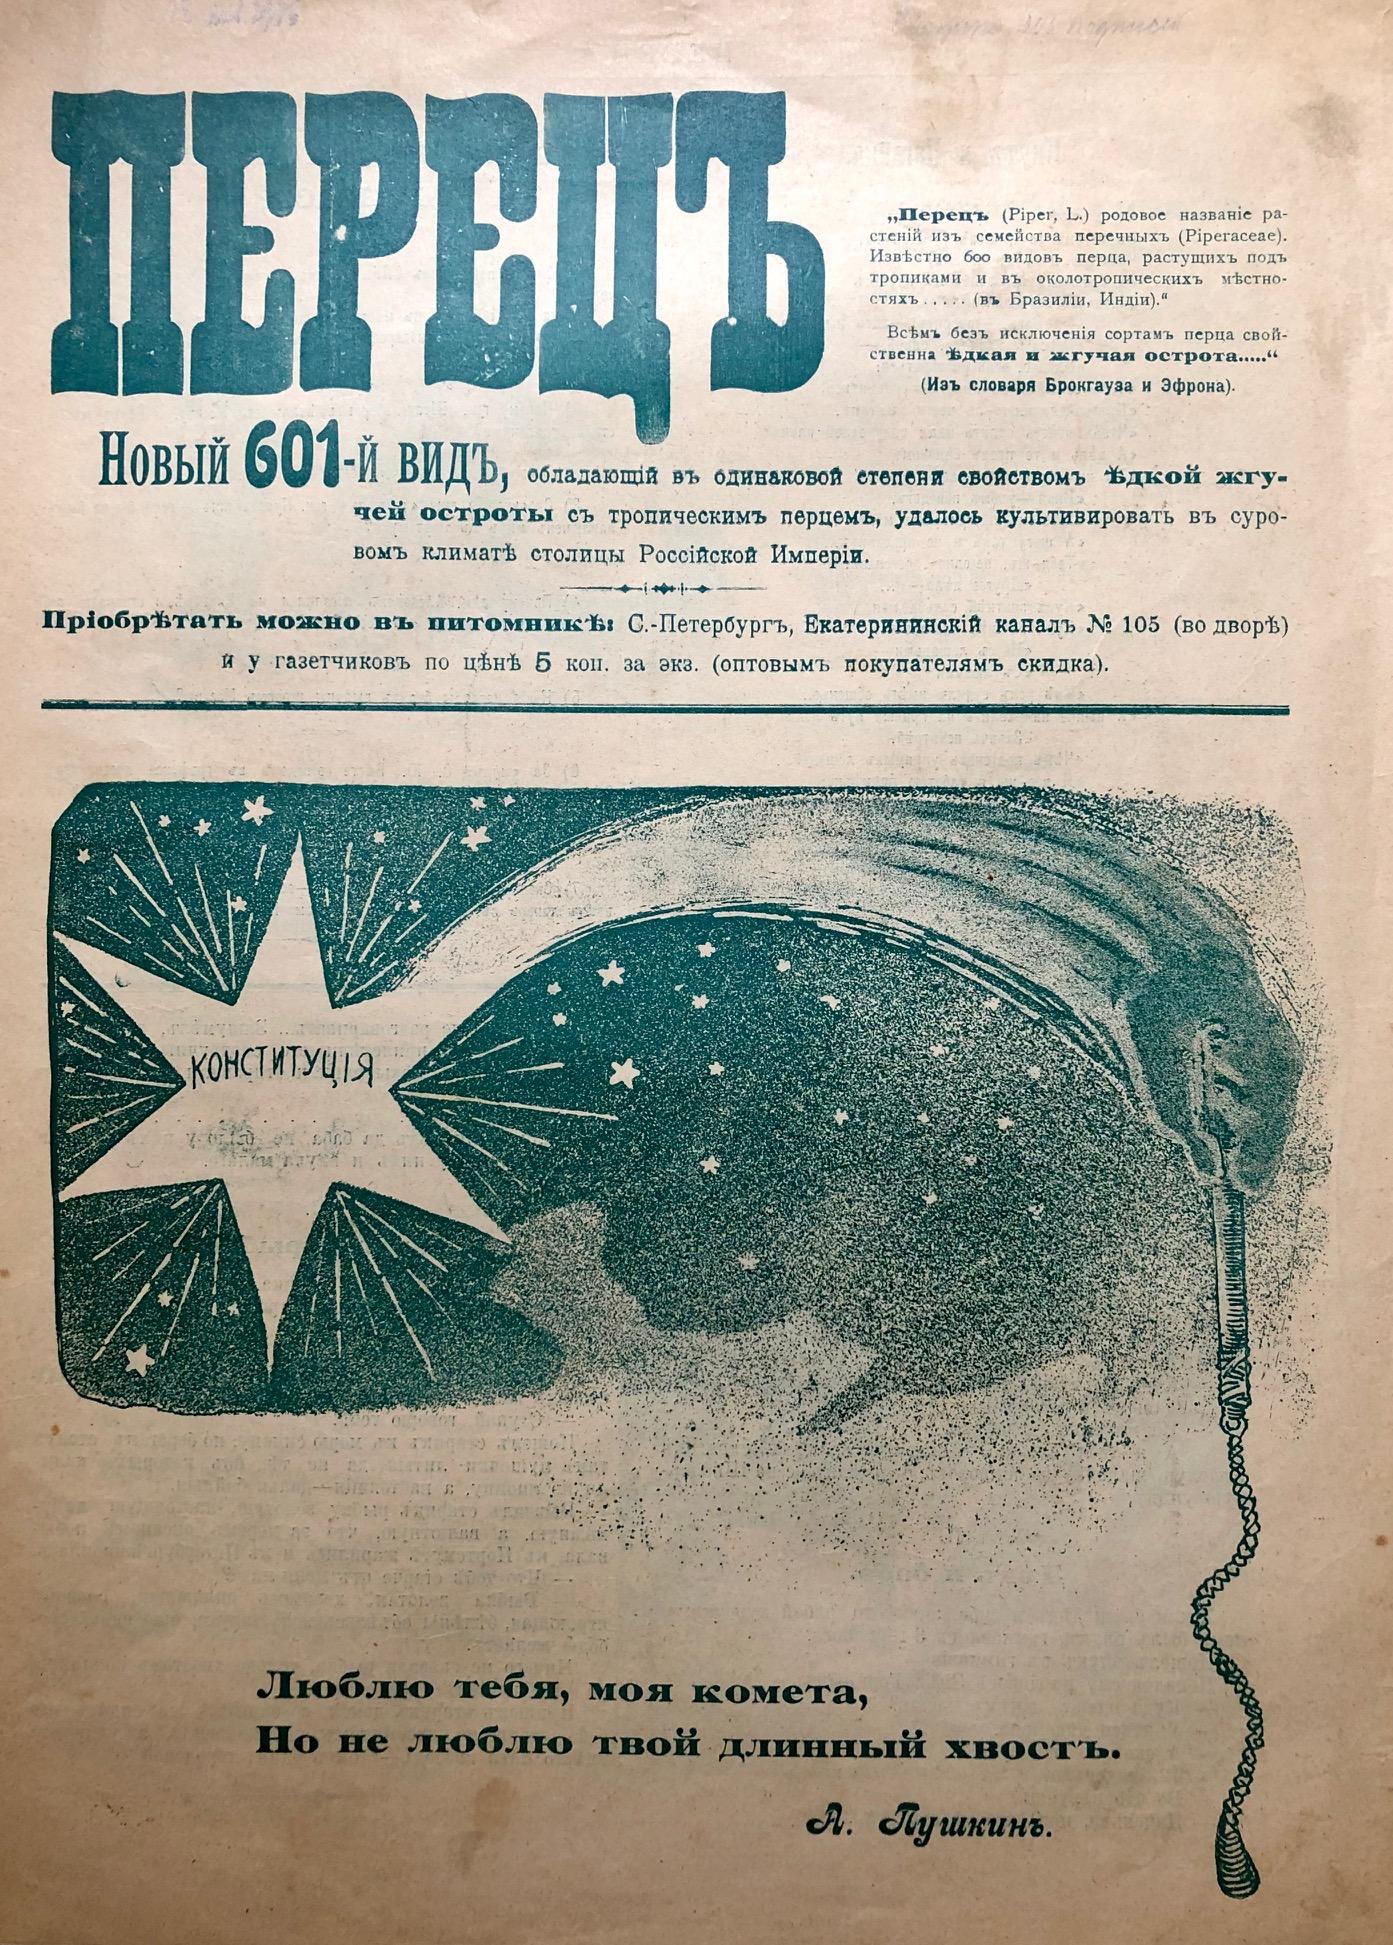 Lot 494 - Le poivre. Перец. 1906 г., № 1. (сборник). Издатель А. [...]